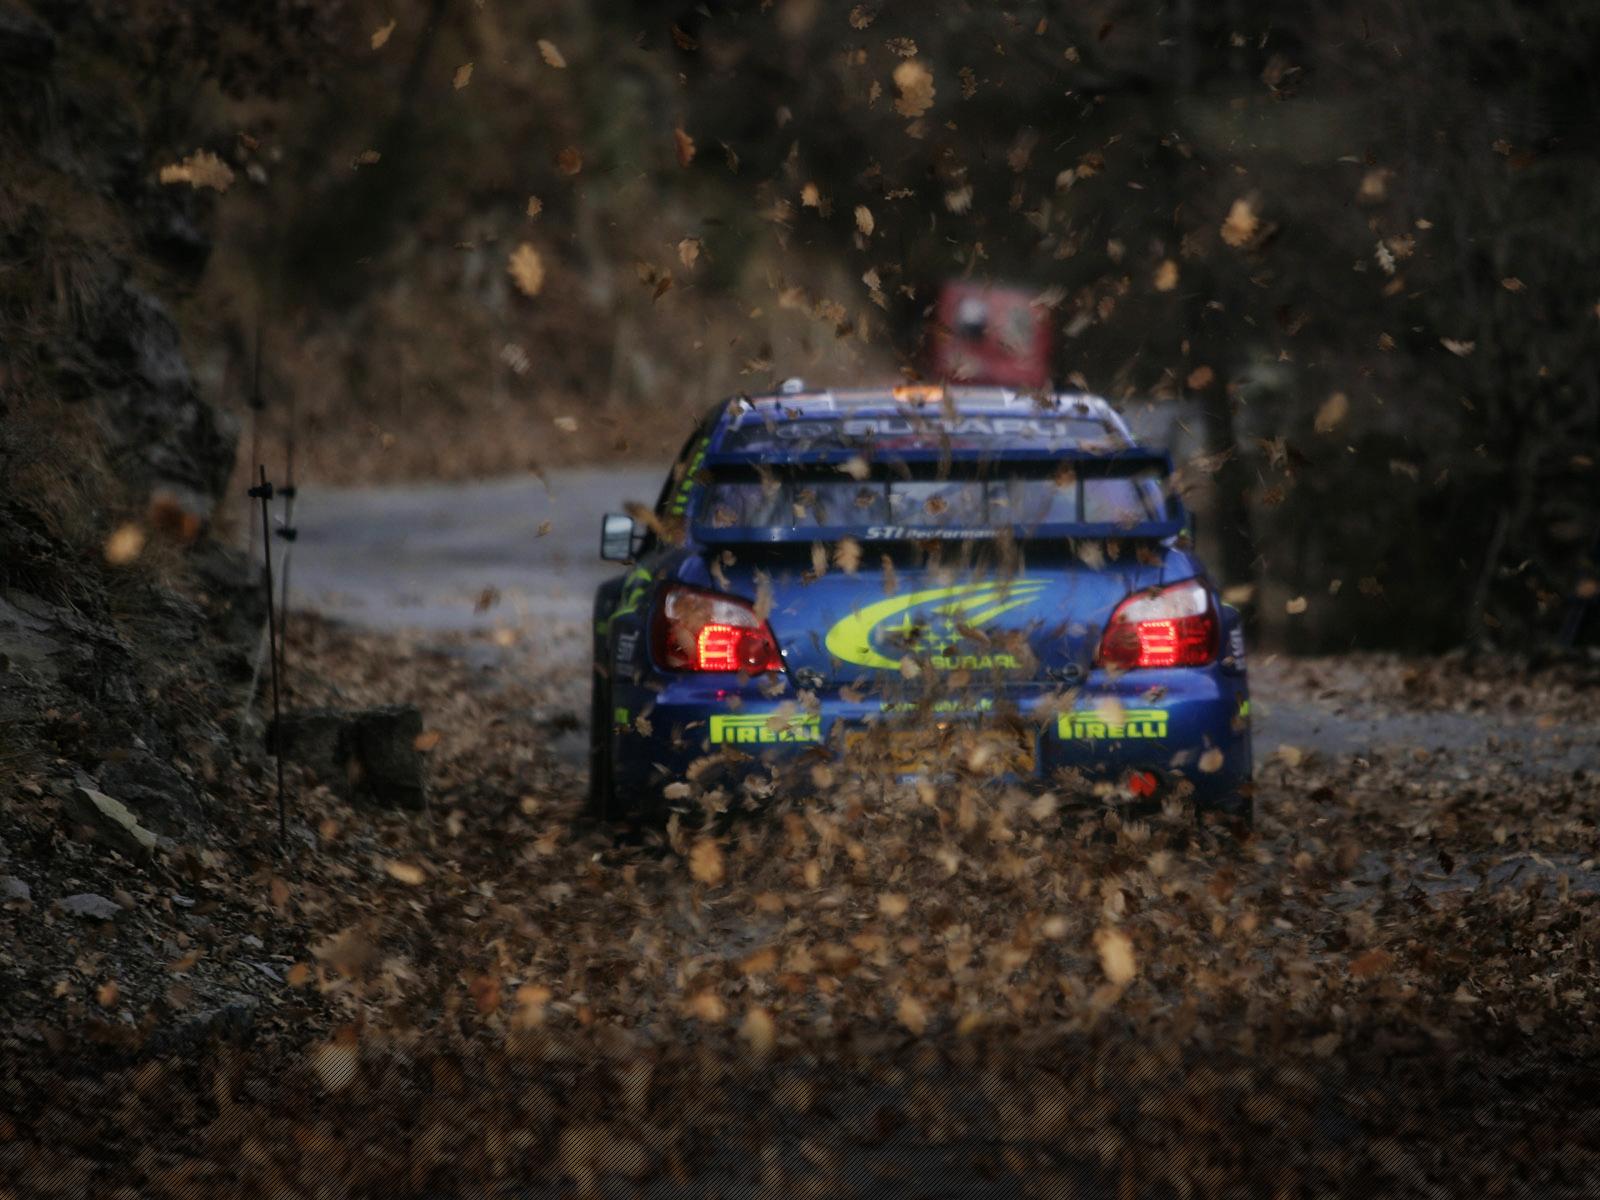 Sports Leaves Car Blue Cars Vehicle Rally Cars Subaru Racing Subaru Impreza  Motorsport Auto Racing Rallying